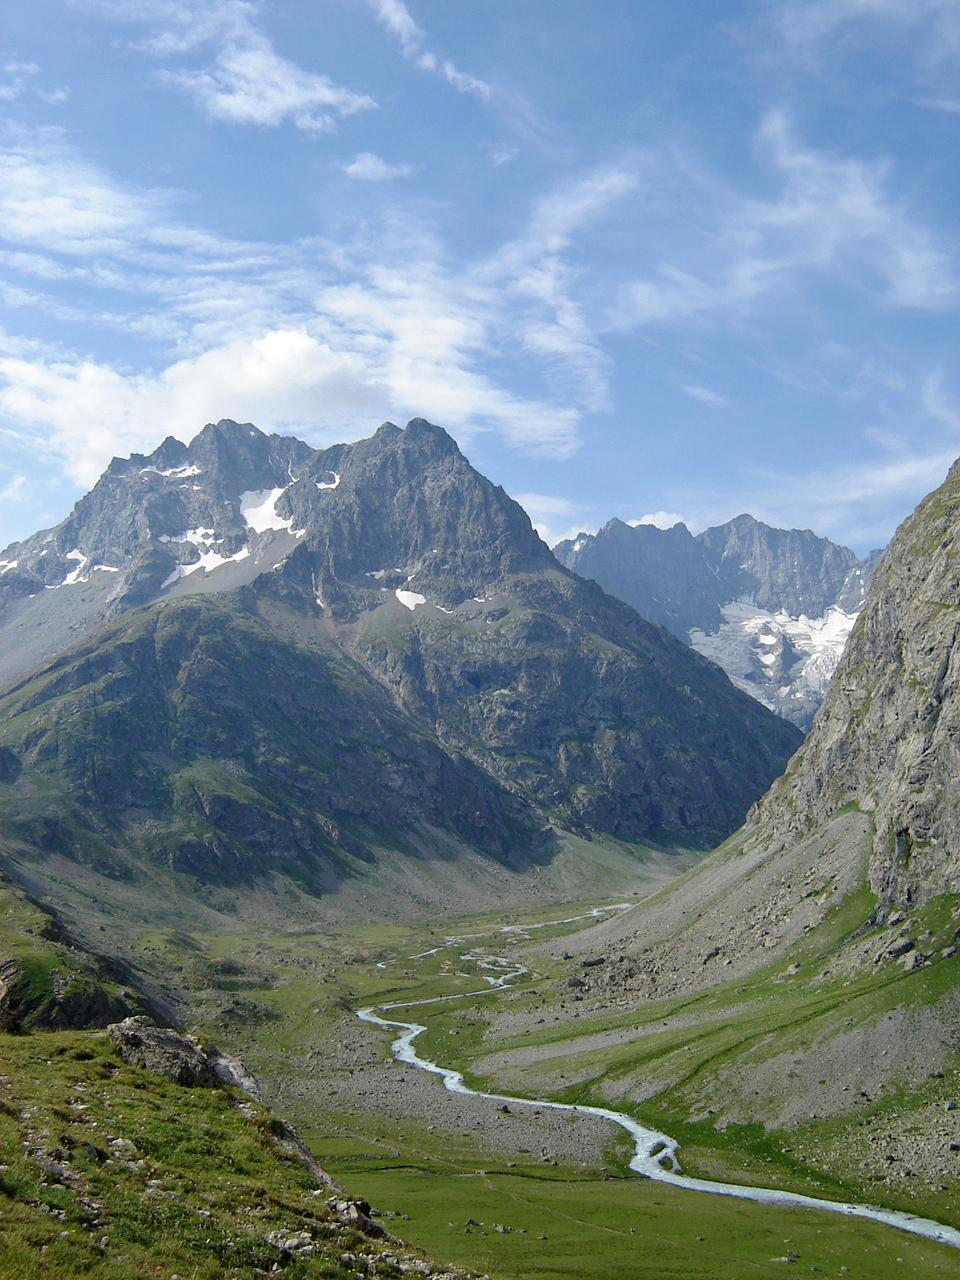 Écrins National Park - Wikipedia